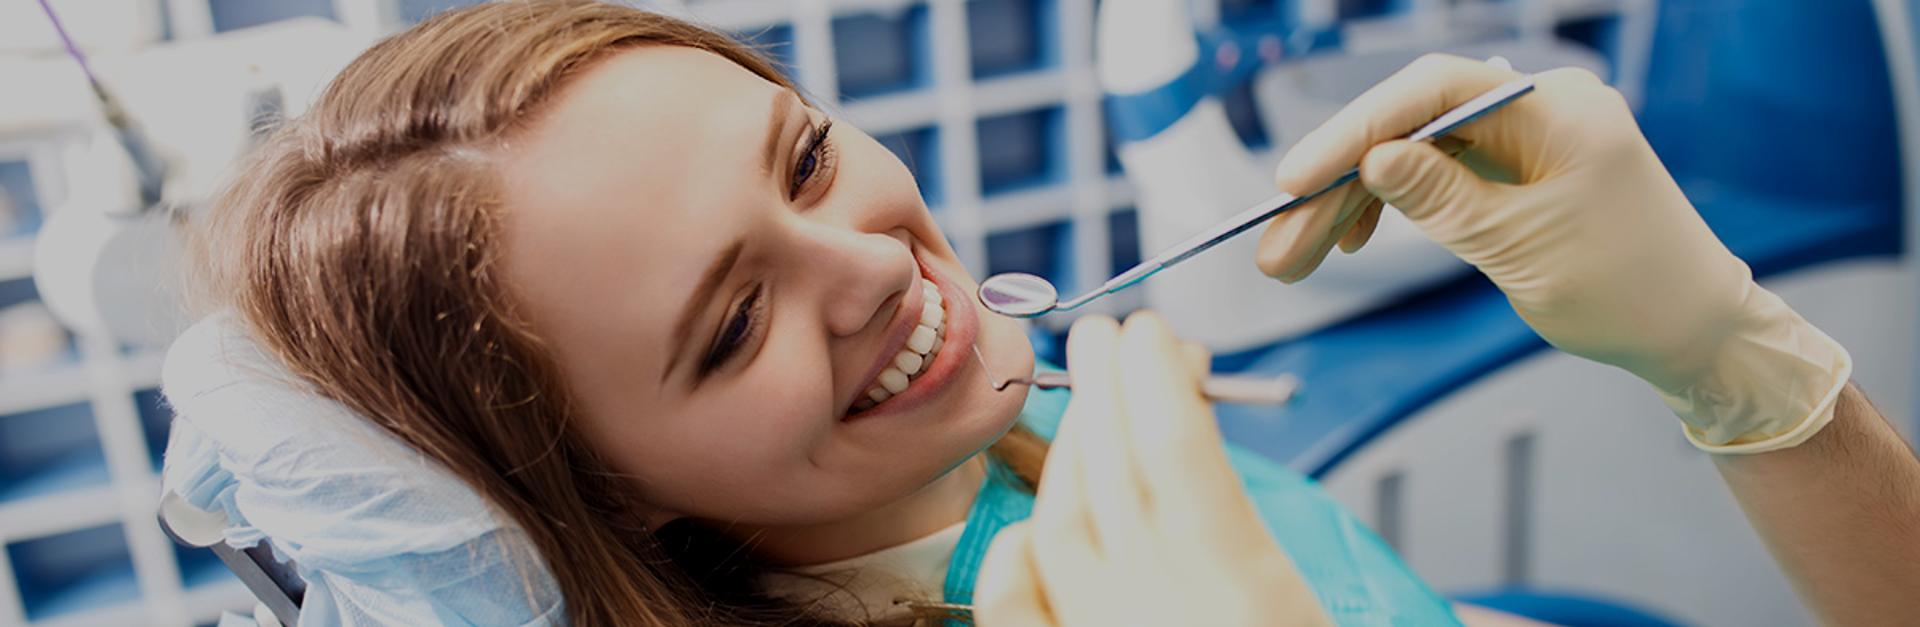 Root Canal Dental Procedure